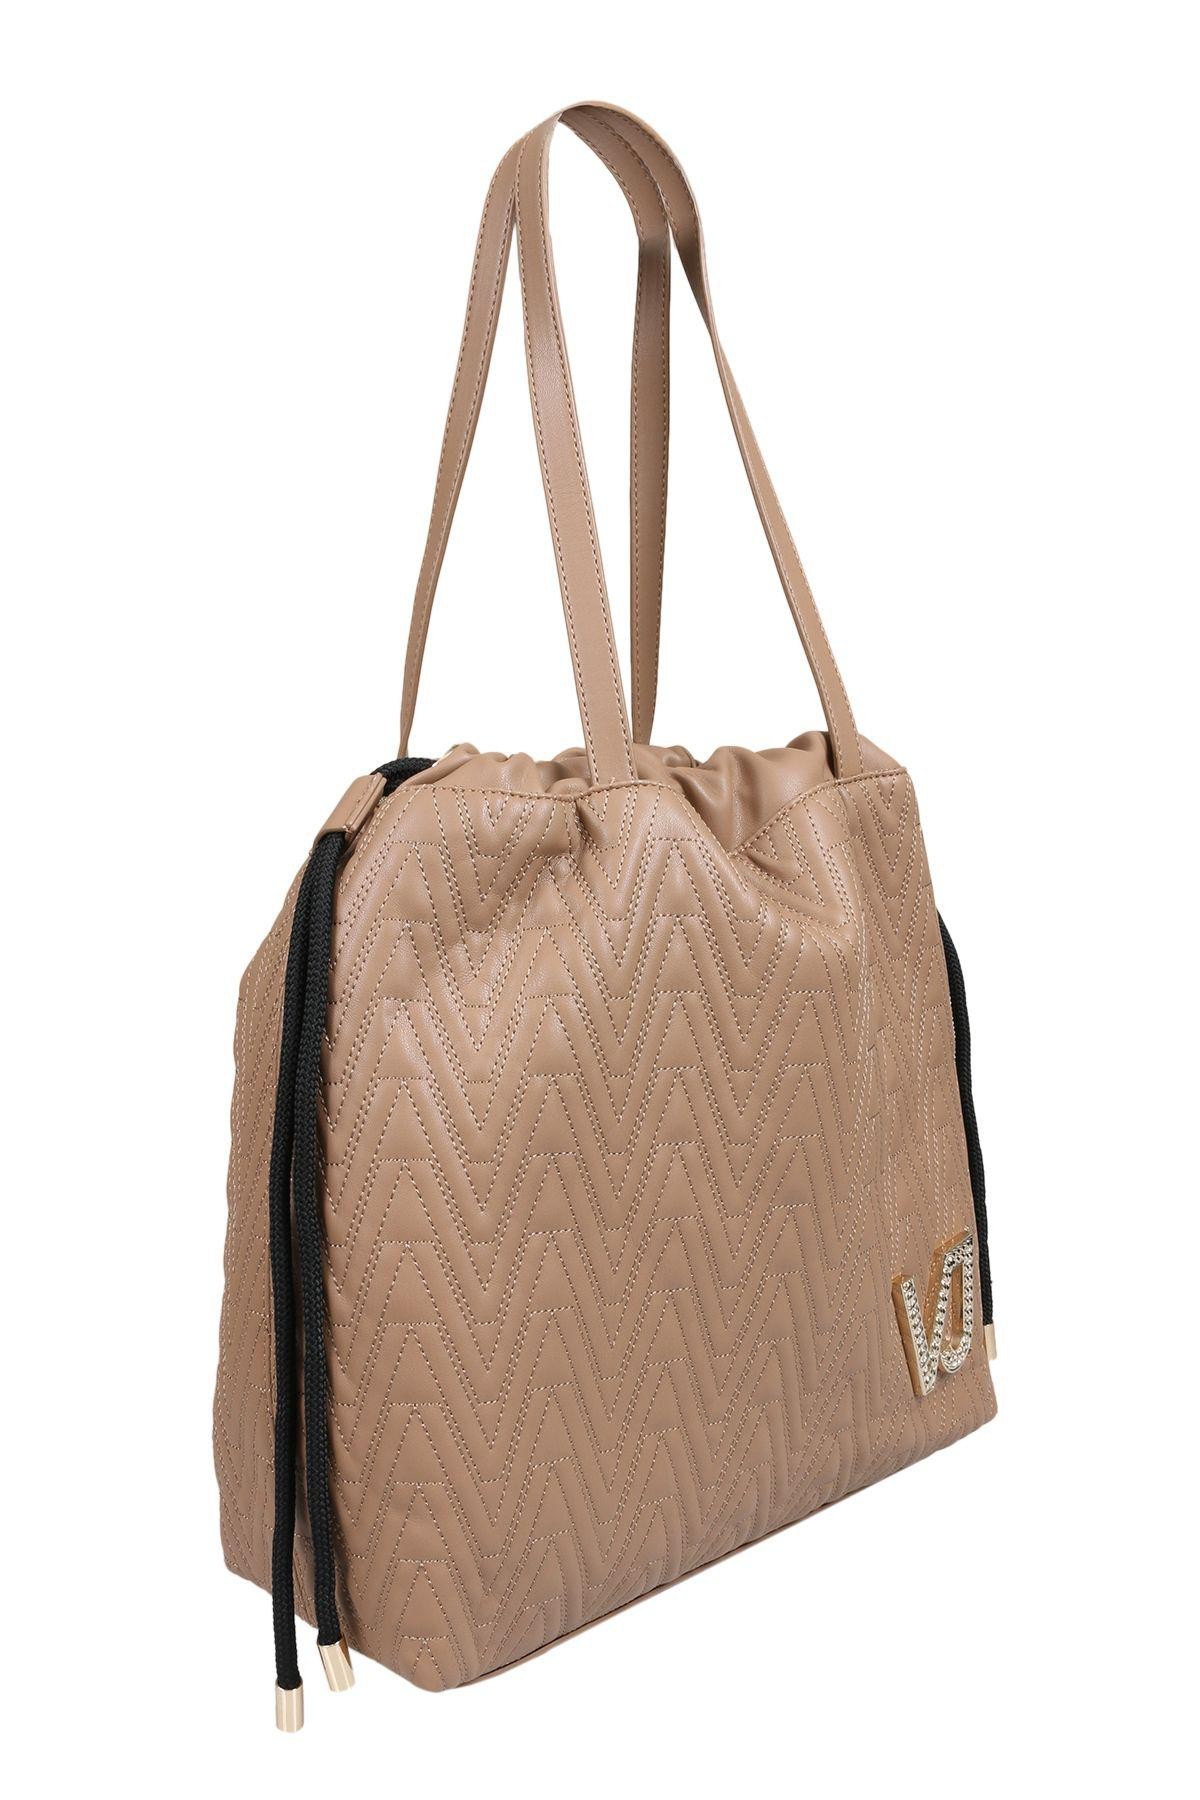 78bf295bb20b Lyst - Versace Ee1vsbbi3 E723 Tan Tote Bag in Brown